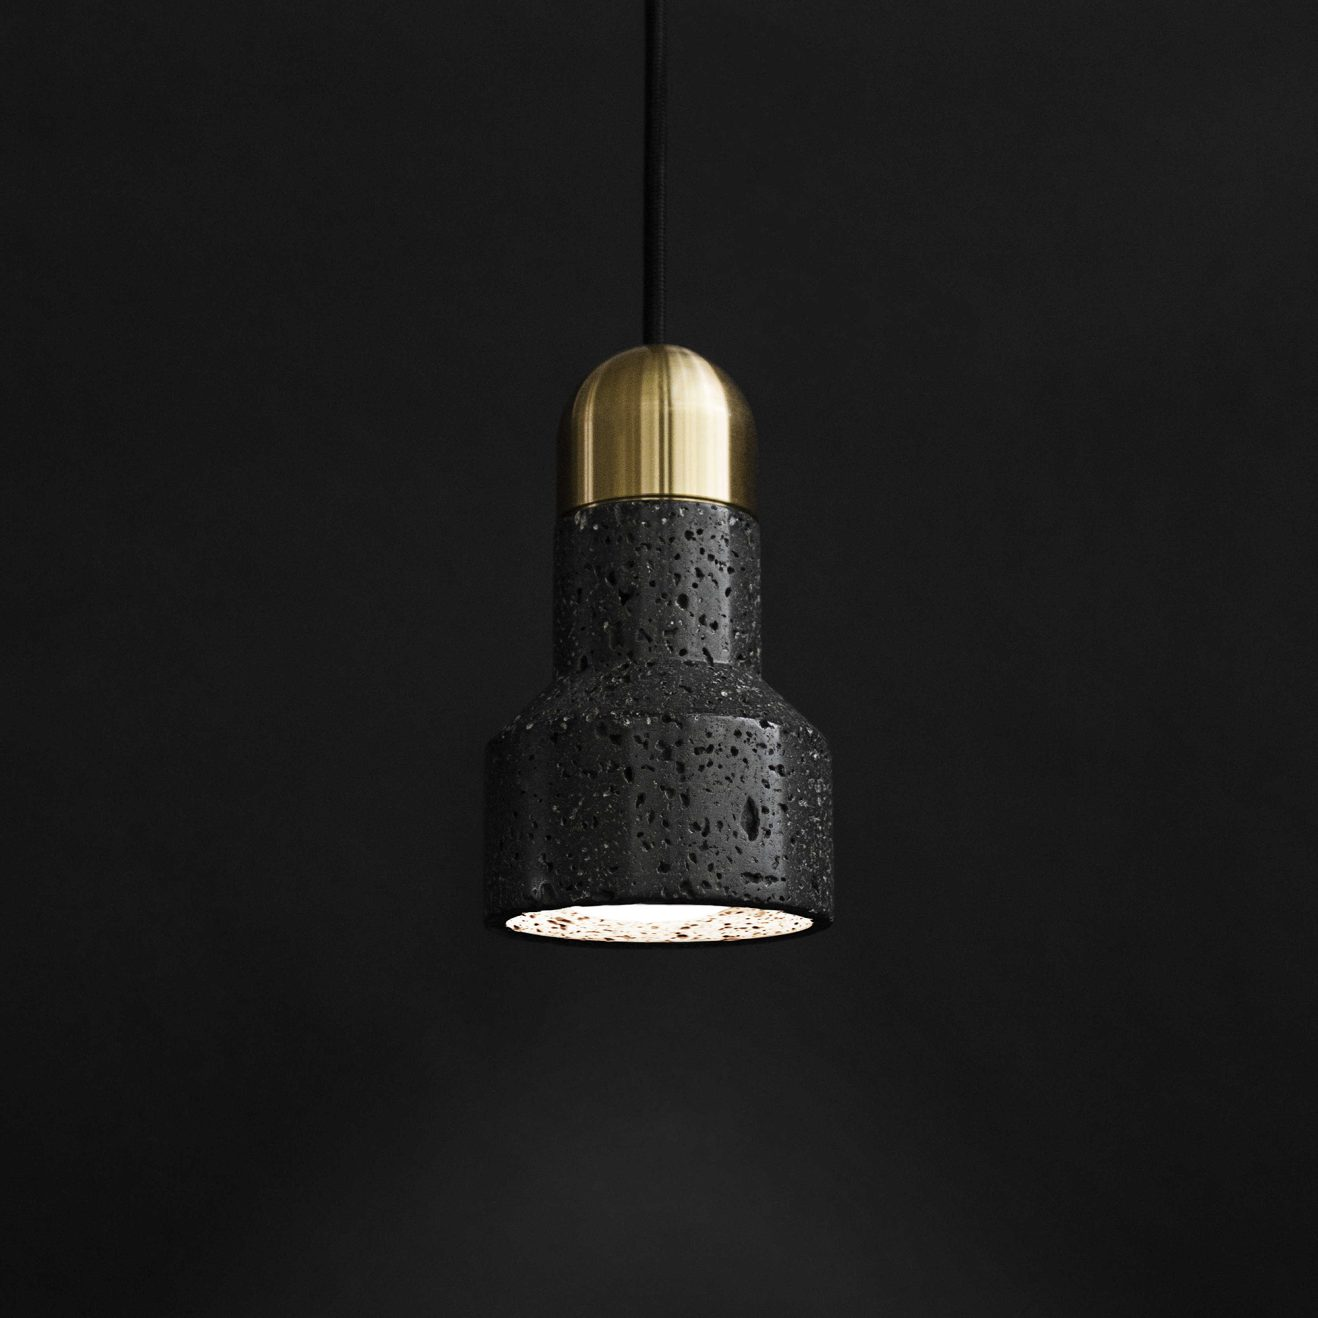 Buzao-Qie-Lava-Stone-Pendant-Lamp-Savannah-Bay-Gallery-3